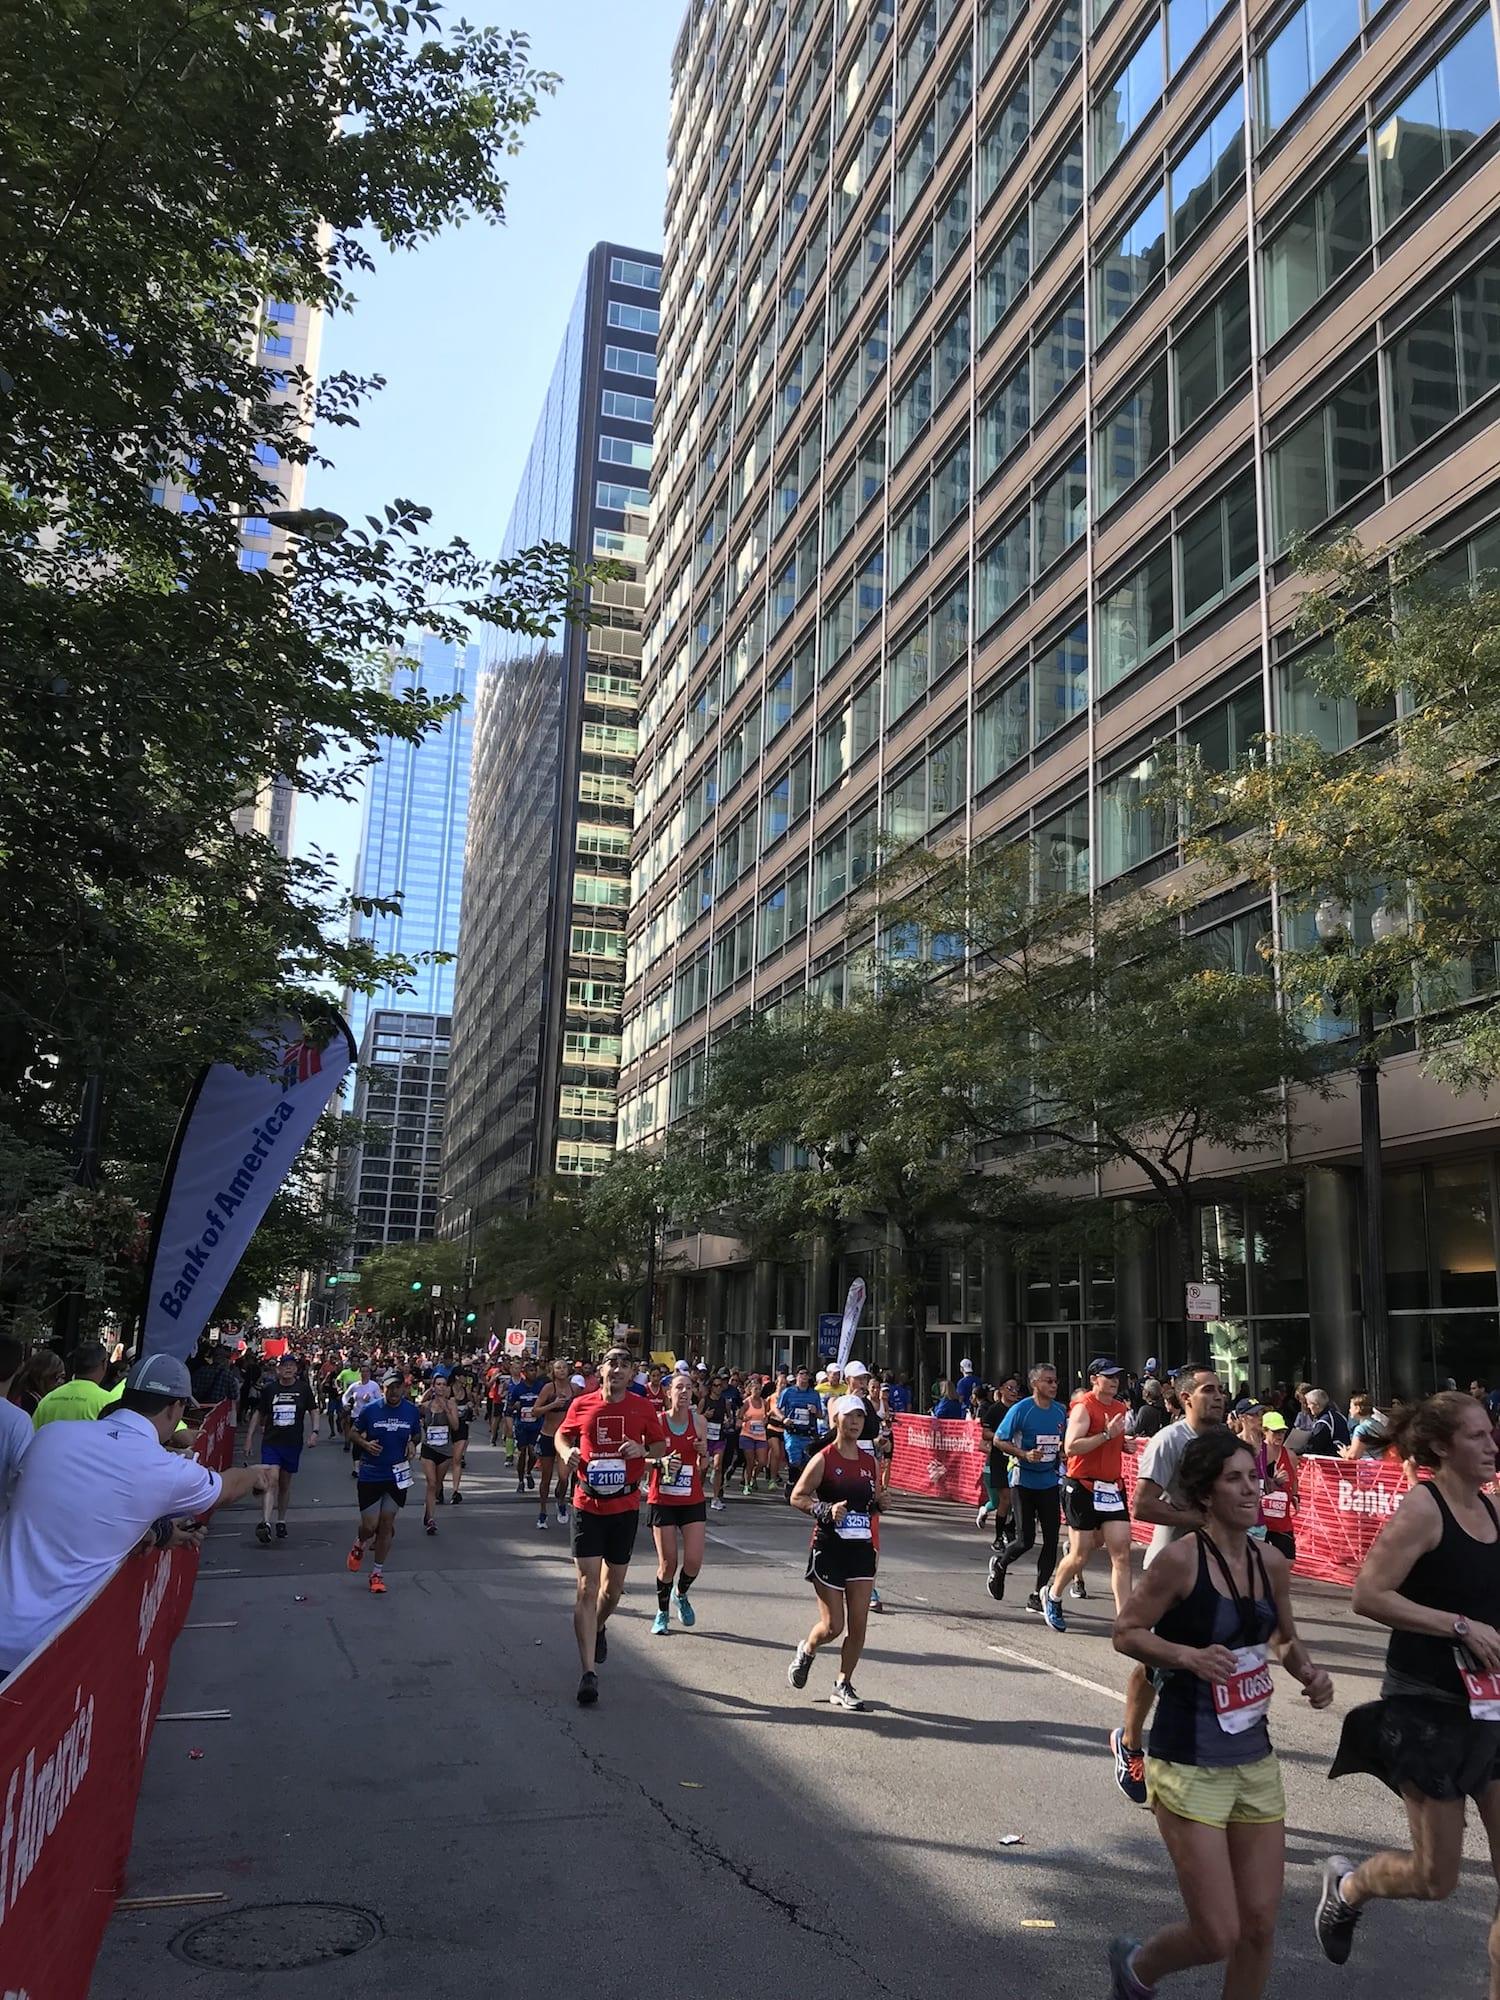 Runners in the Chicago Marathon